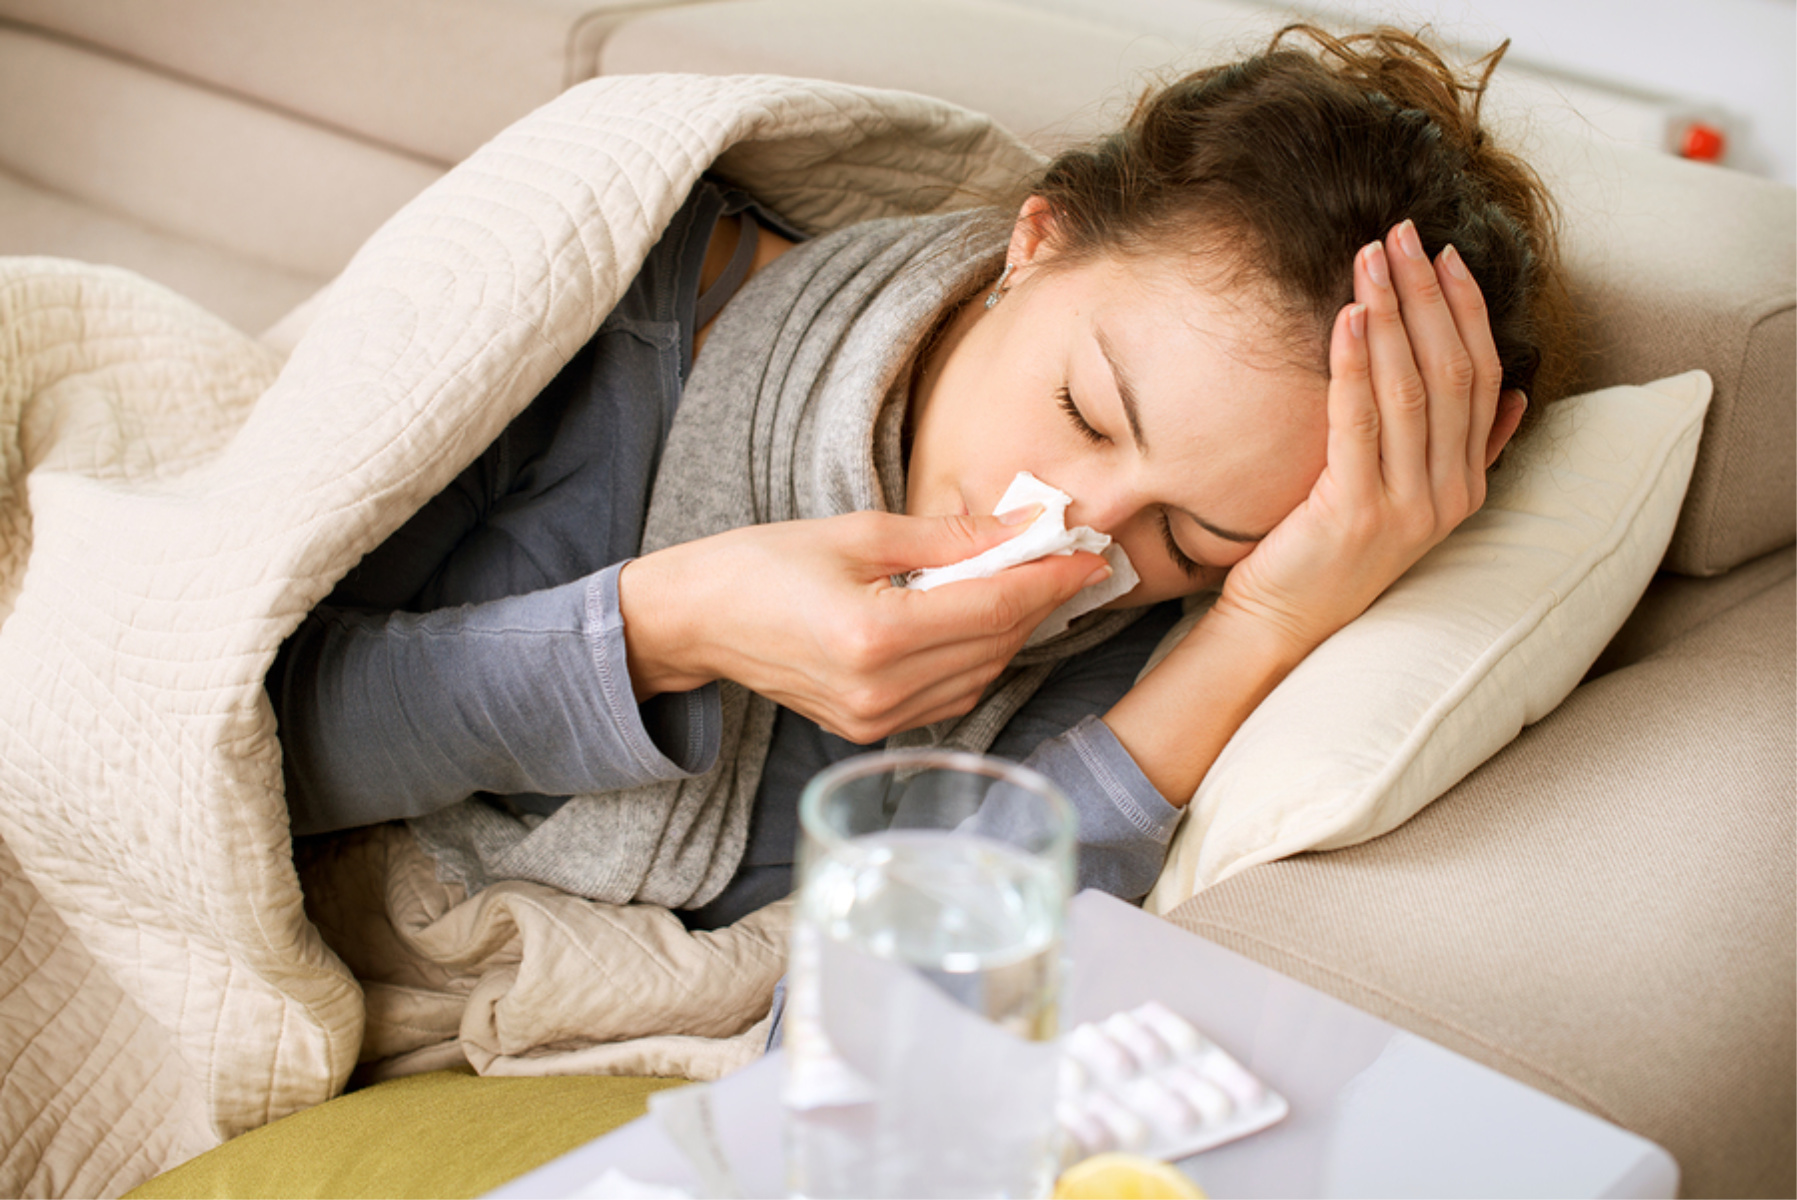 Home Health Care in Buckeye AZ: Disease Prevention